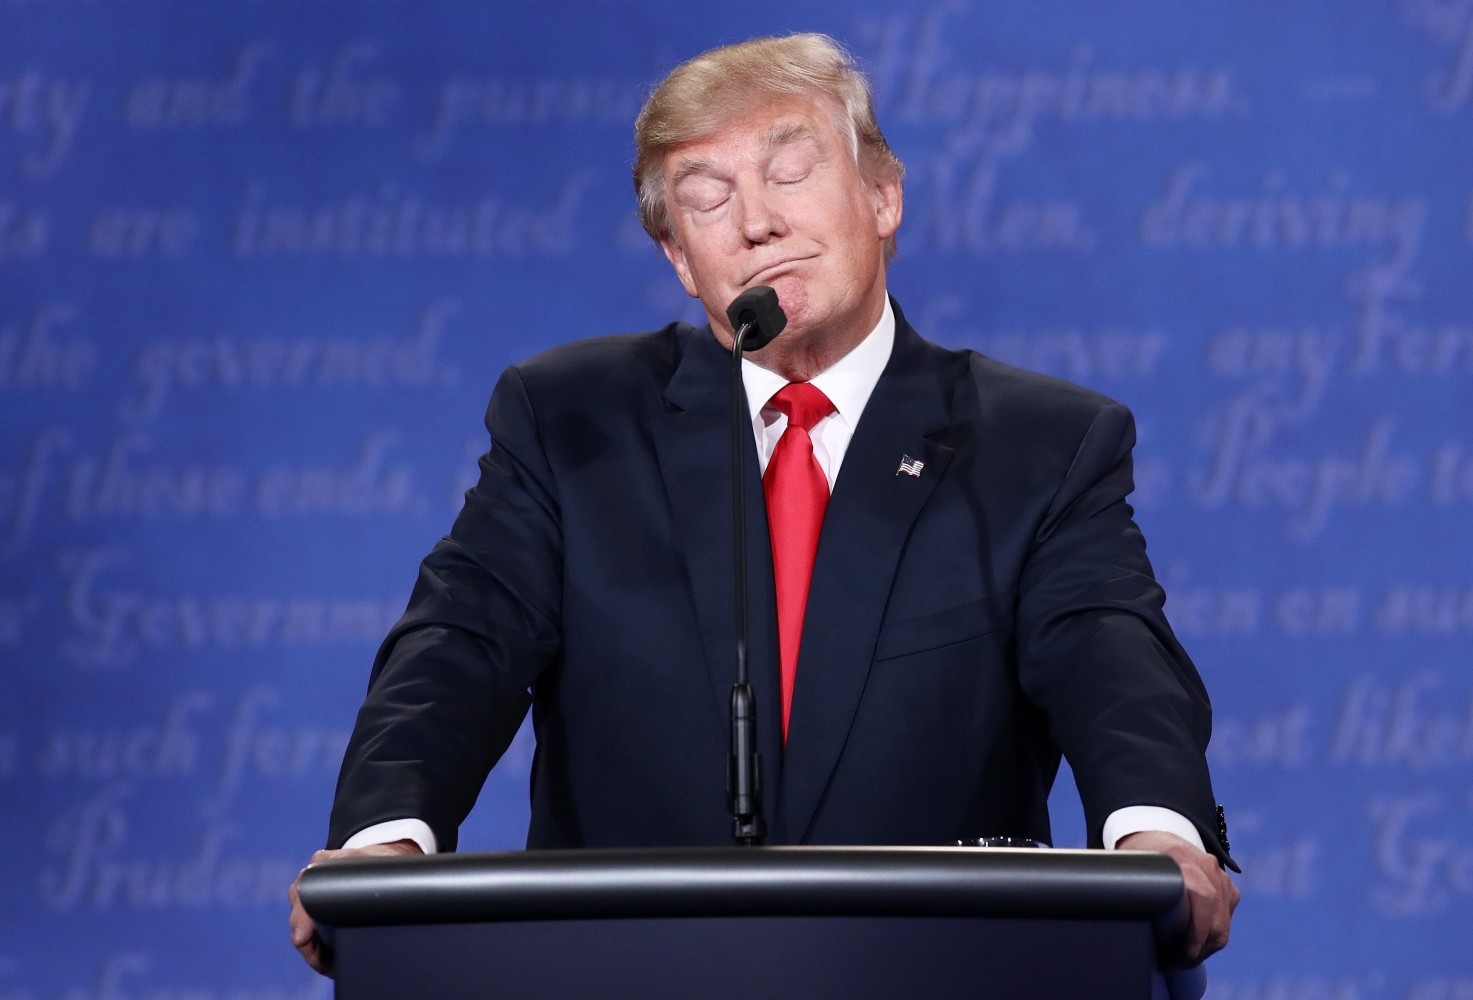 'Bad Hombres': Social media explodes over Donald Trump's immigration comments